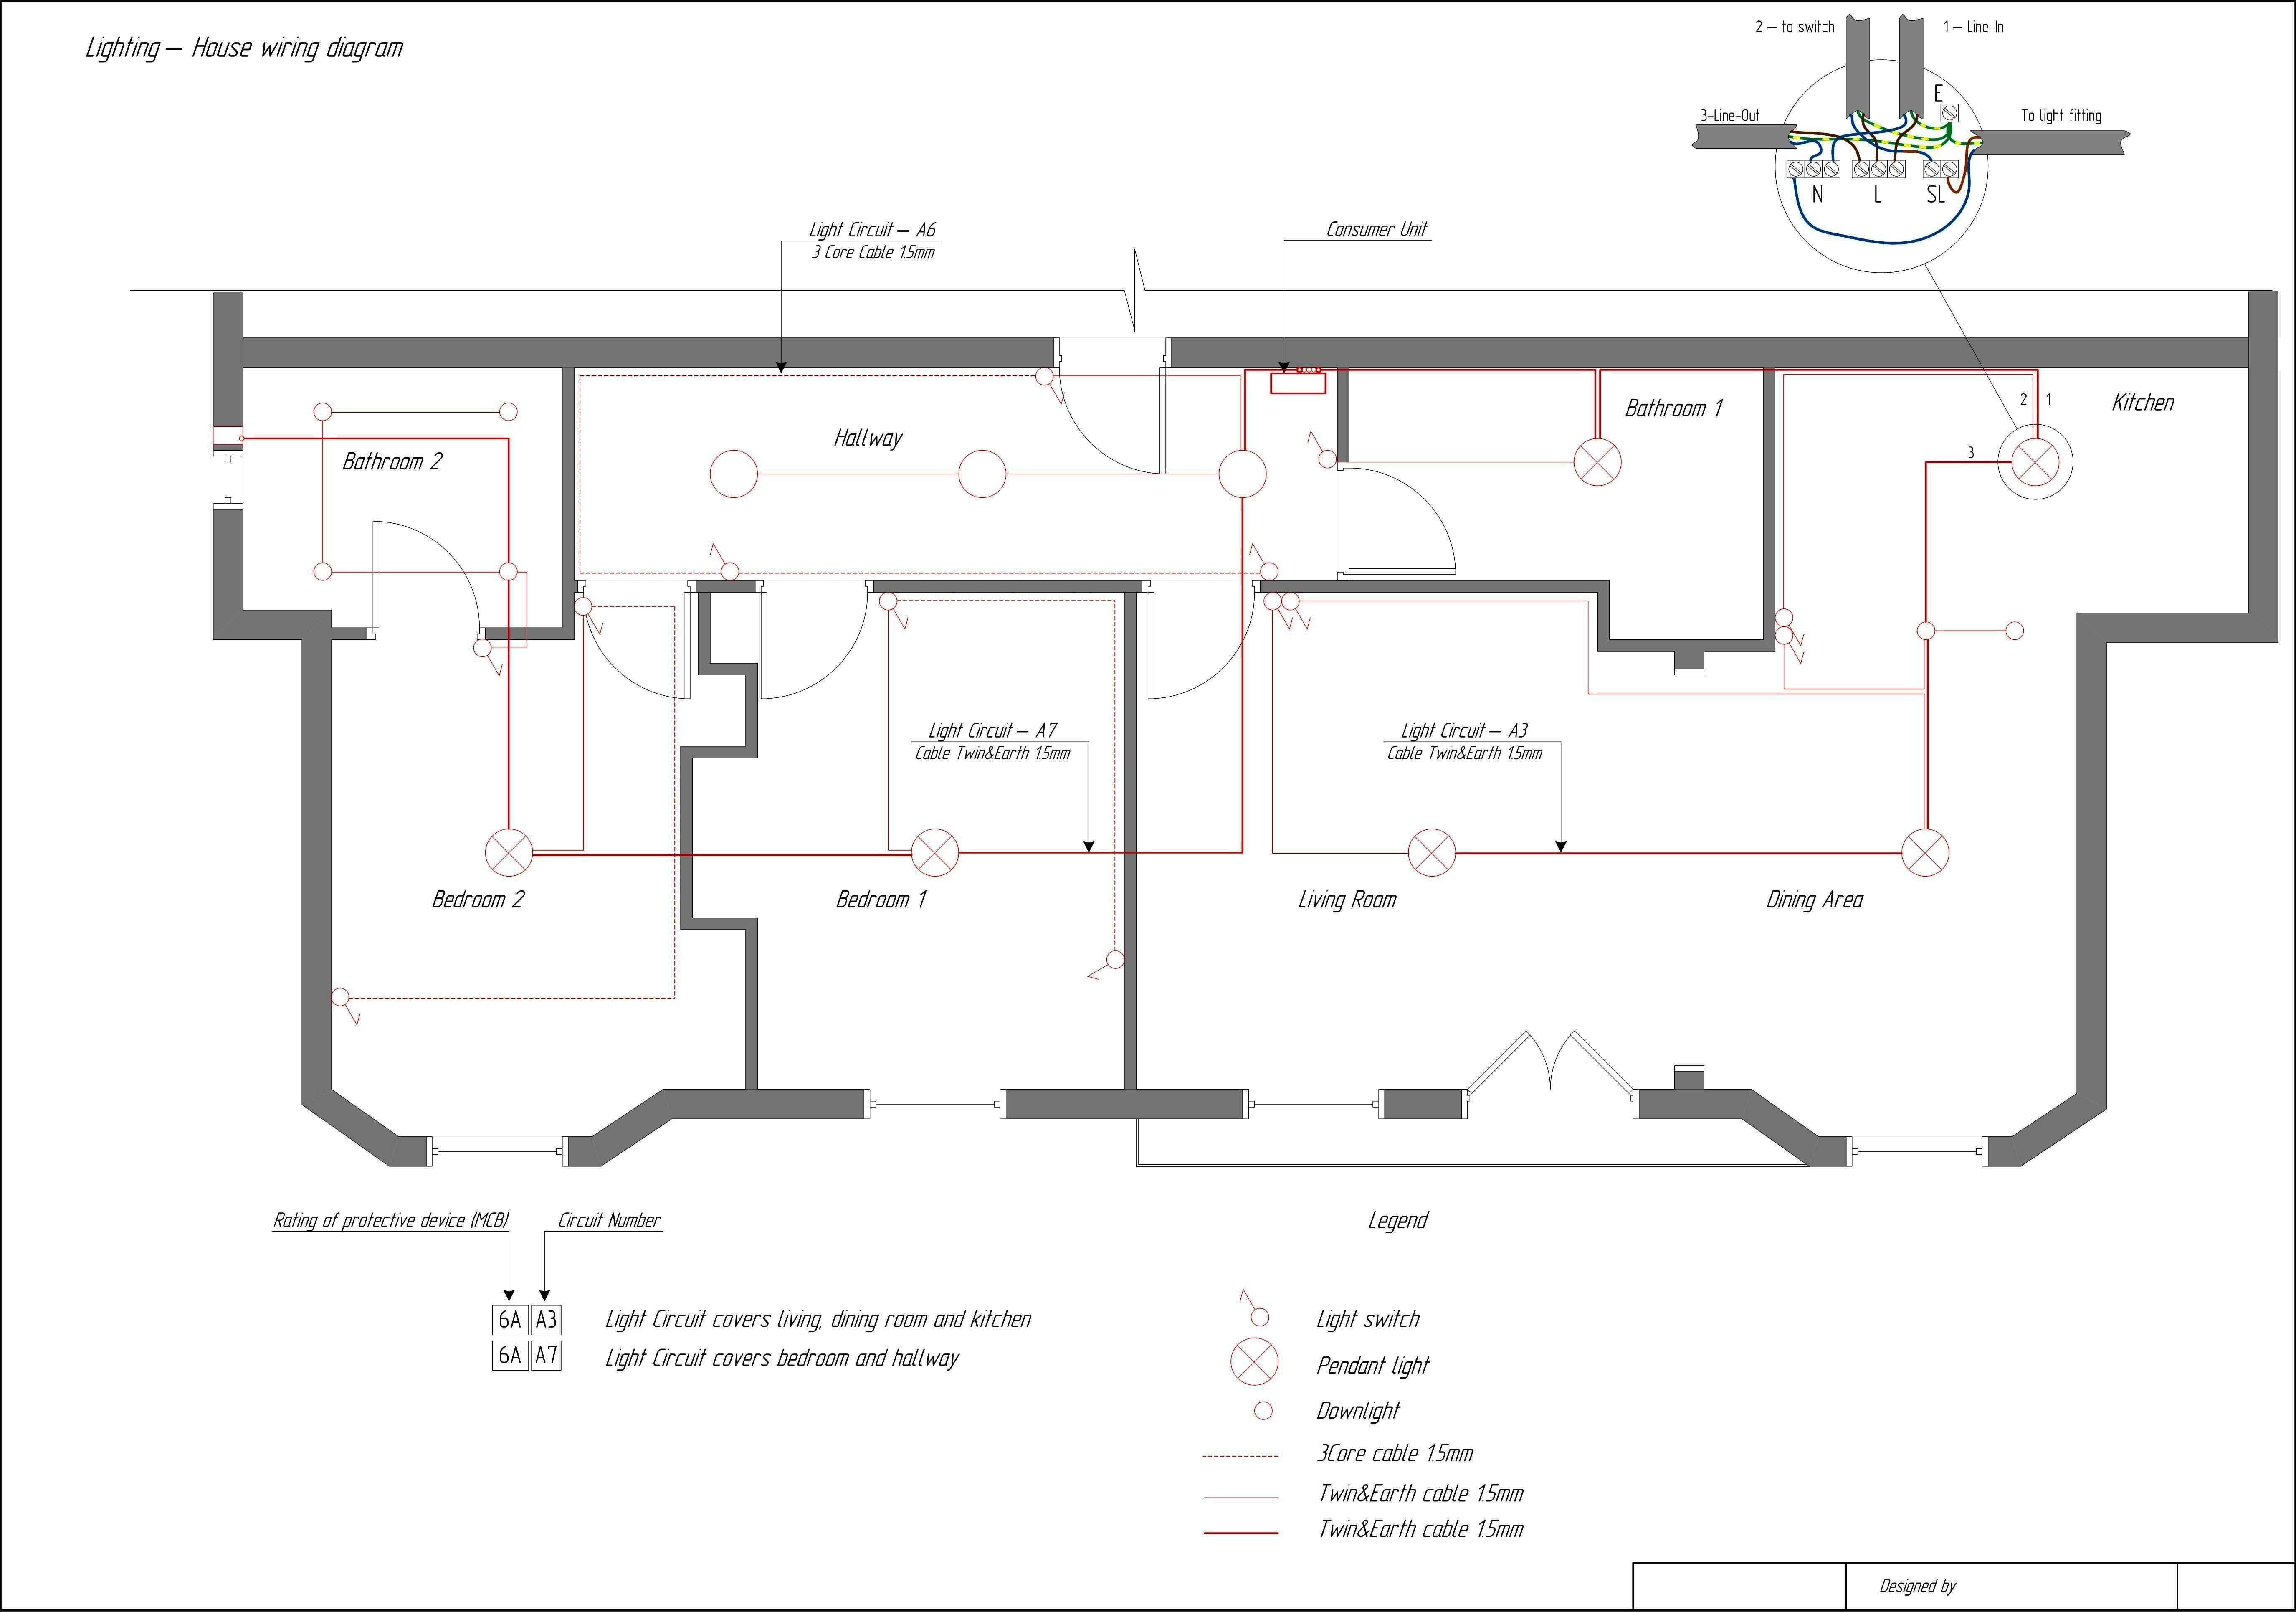 restaurant wiring diagram wiring diagram name restaurant electrical diagram